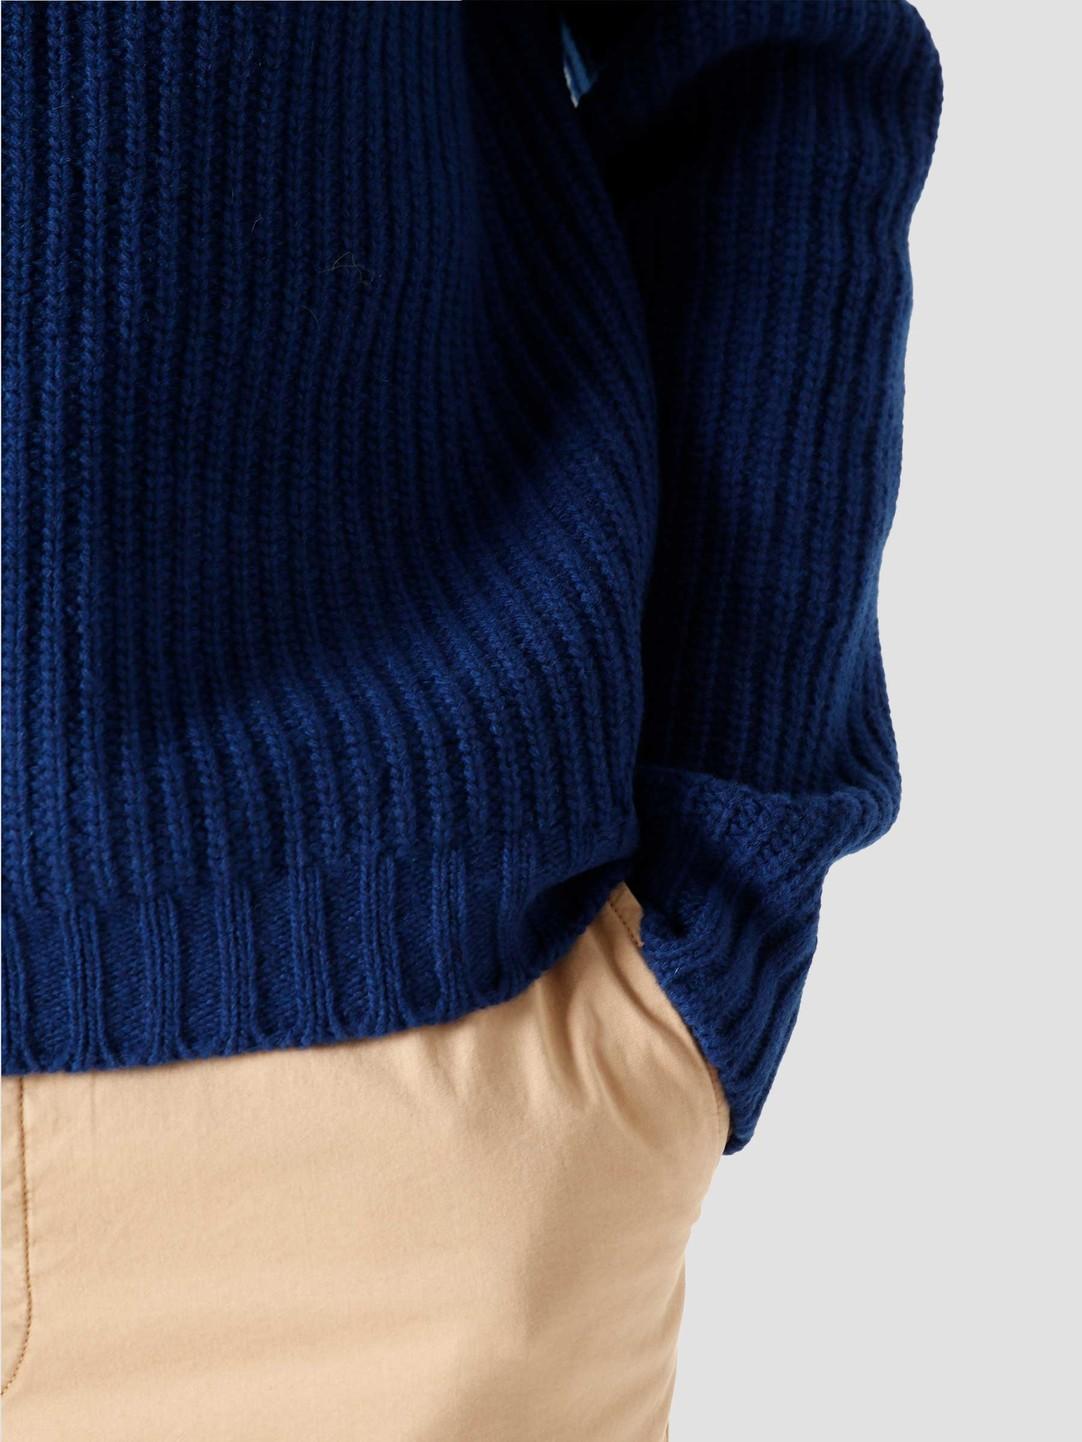 Libertine Libertine Libertine Libertine Transfer C-Neck Sweater Deep Blue 1972